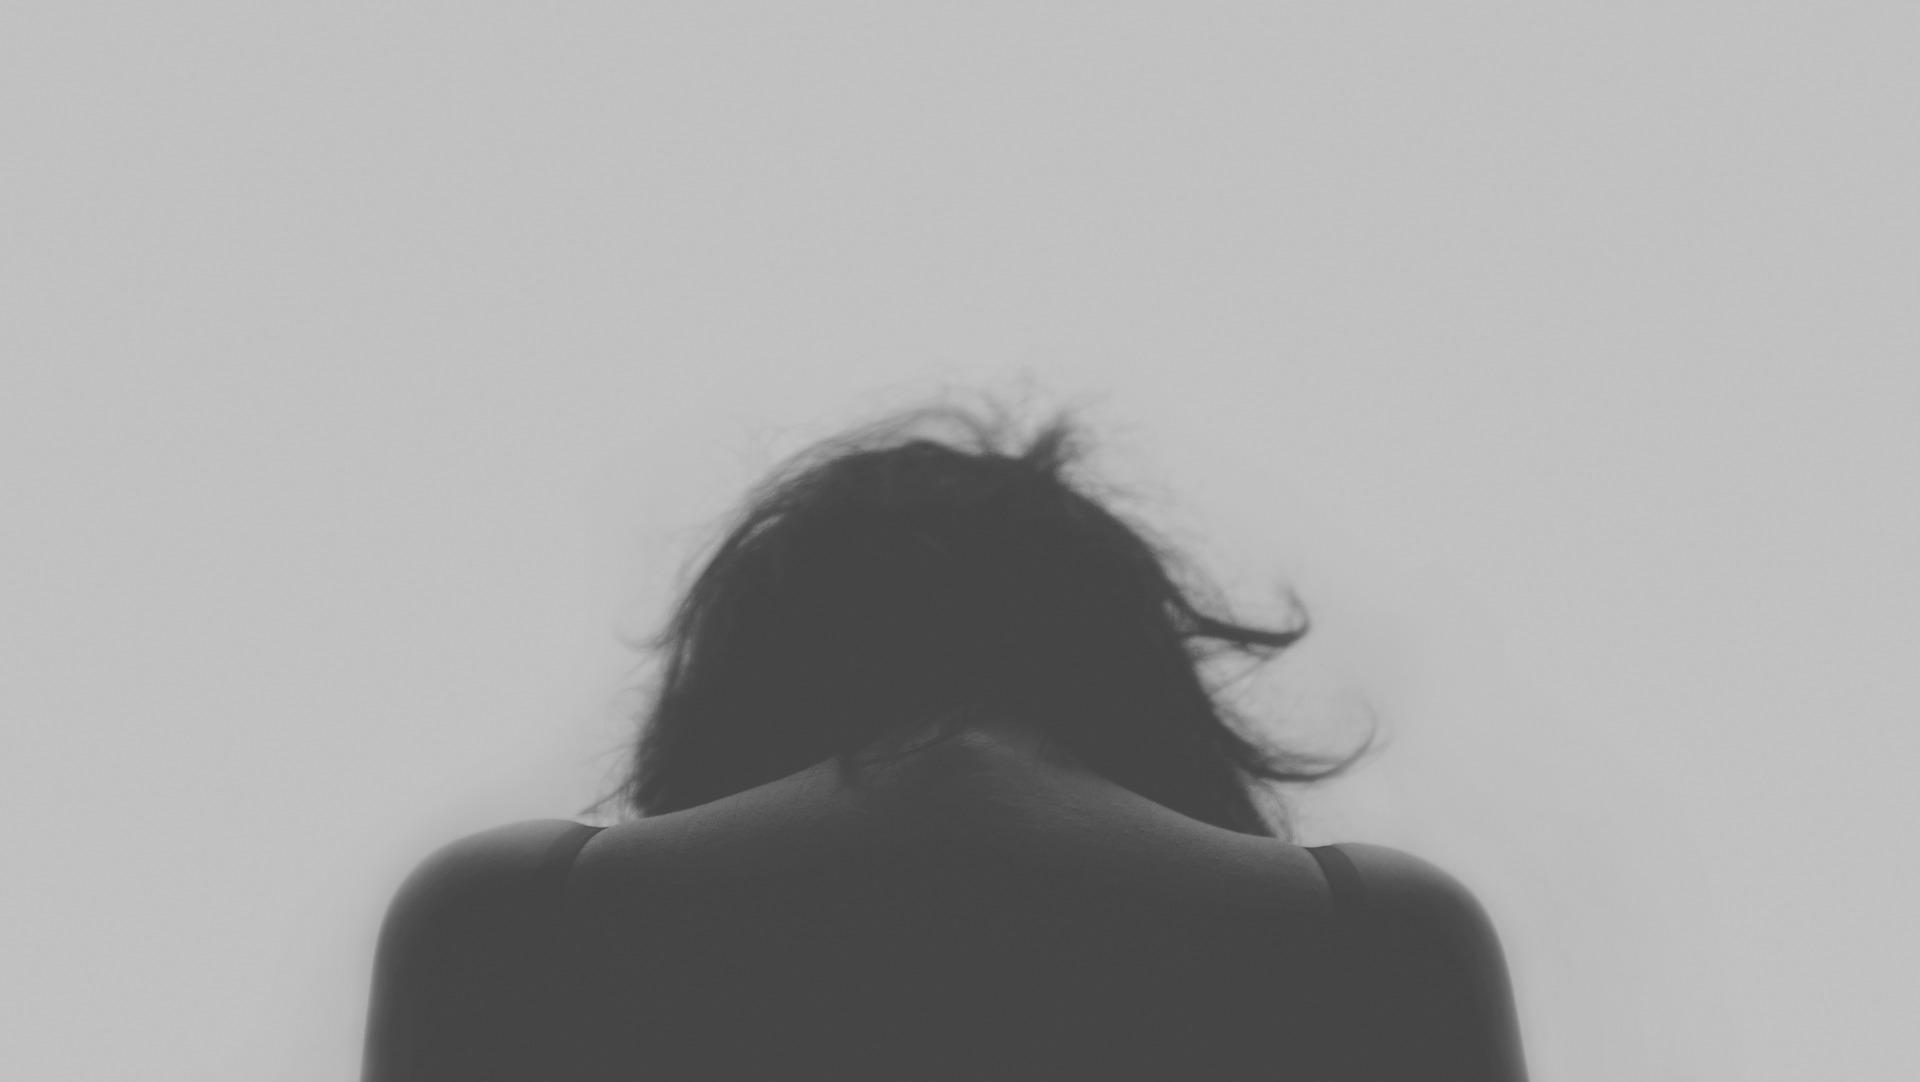 Dugotrajni simptomi menopauze povezani s većim rizikom od raka dojke